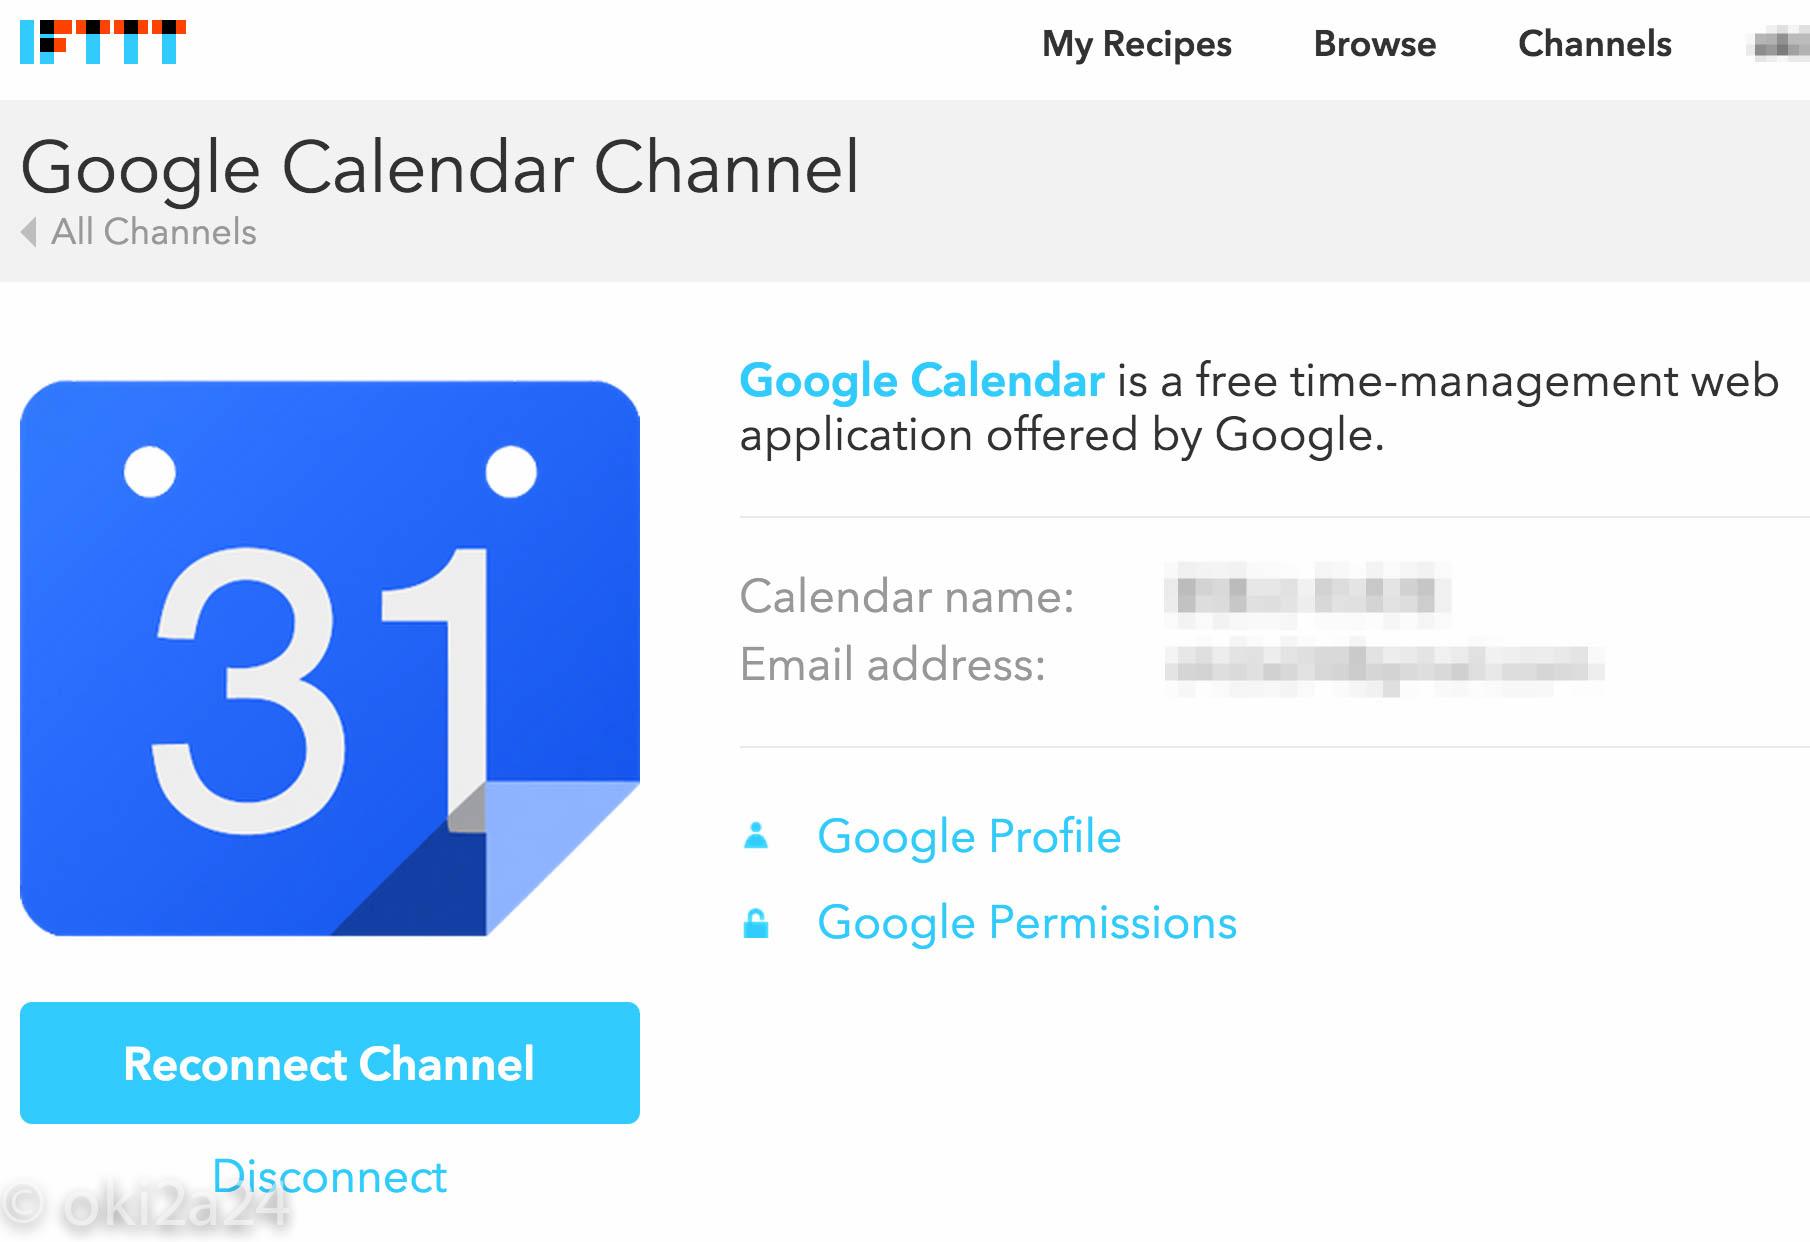 Calendar name:、Email address:、を確認